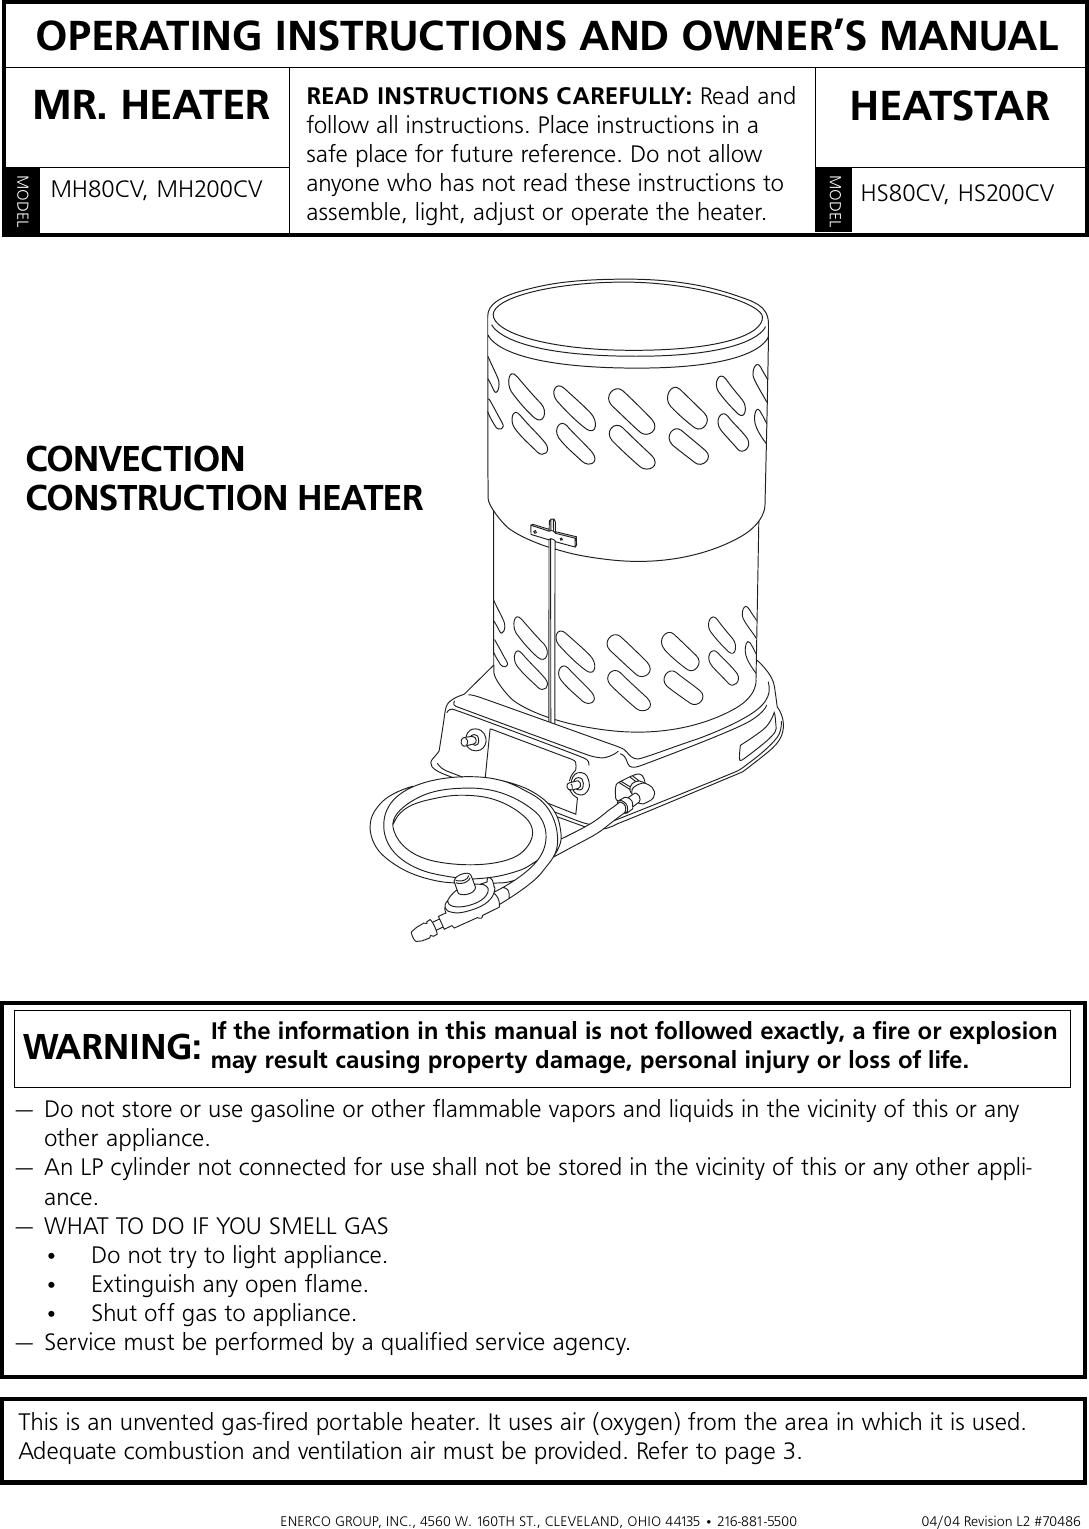 Enerco Hs200cv Users Manual Mh80 200cv Tormax Wiring Diagram